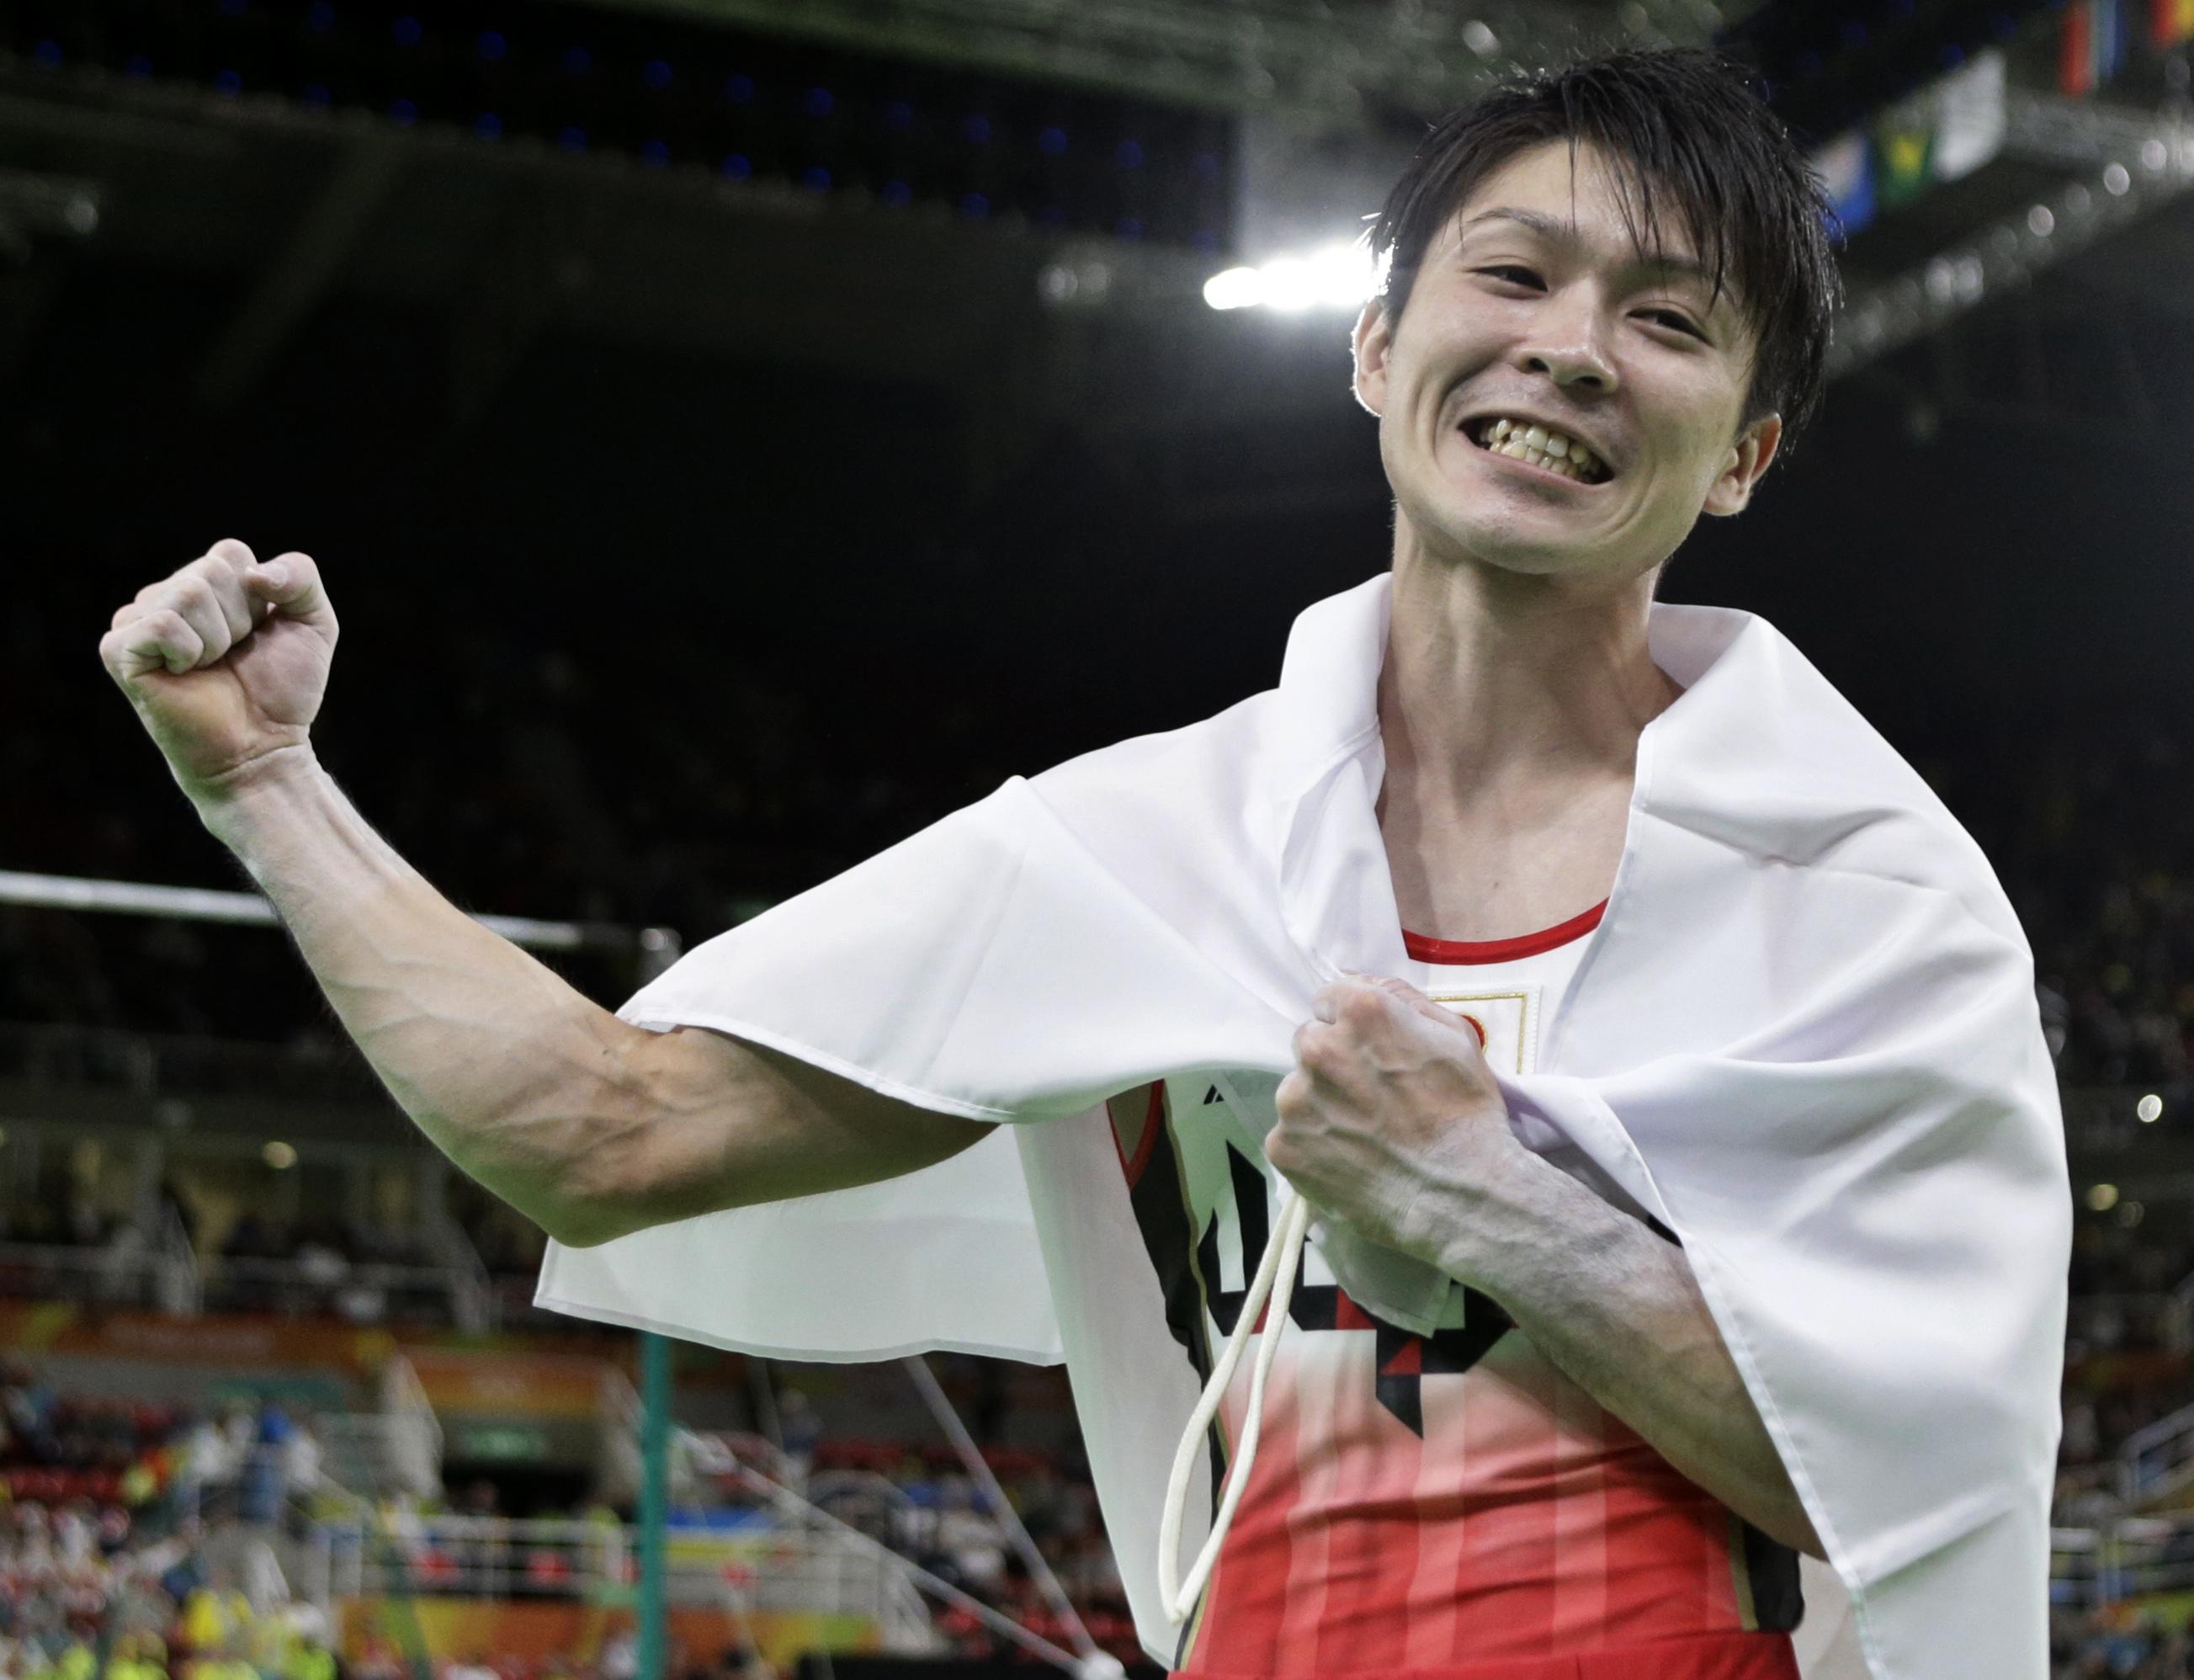 Japan's Kohei Uchimura celebrates his gold during the artistic gymnastics men's individual all-around final at the 2016 Summer Olympics in Rio de Janeiro, Brazil, Wednesday, Aug. 10, 2016. (AP Photo/Rebecca Blackwell)